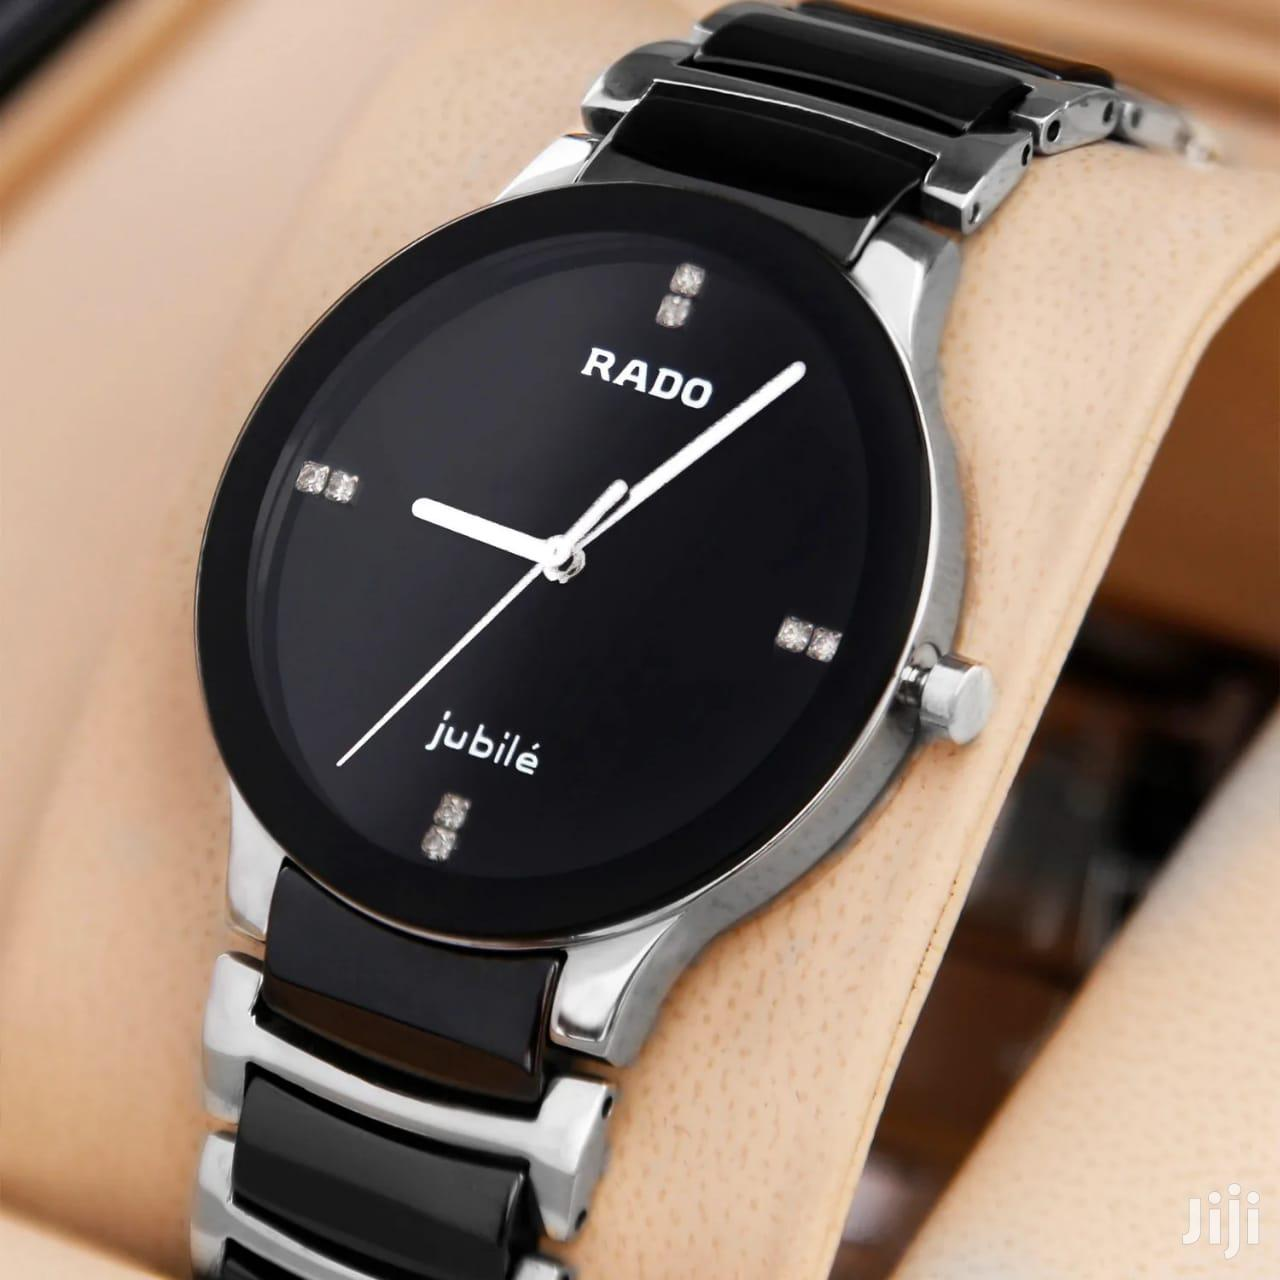 Rado Ceramic Quartz Movement Watches Available at 10,000ksh | Watches for sale in Nairobi Central, Nairobi, Kenya